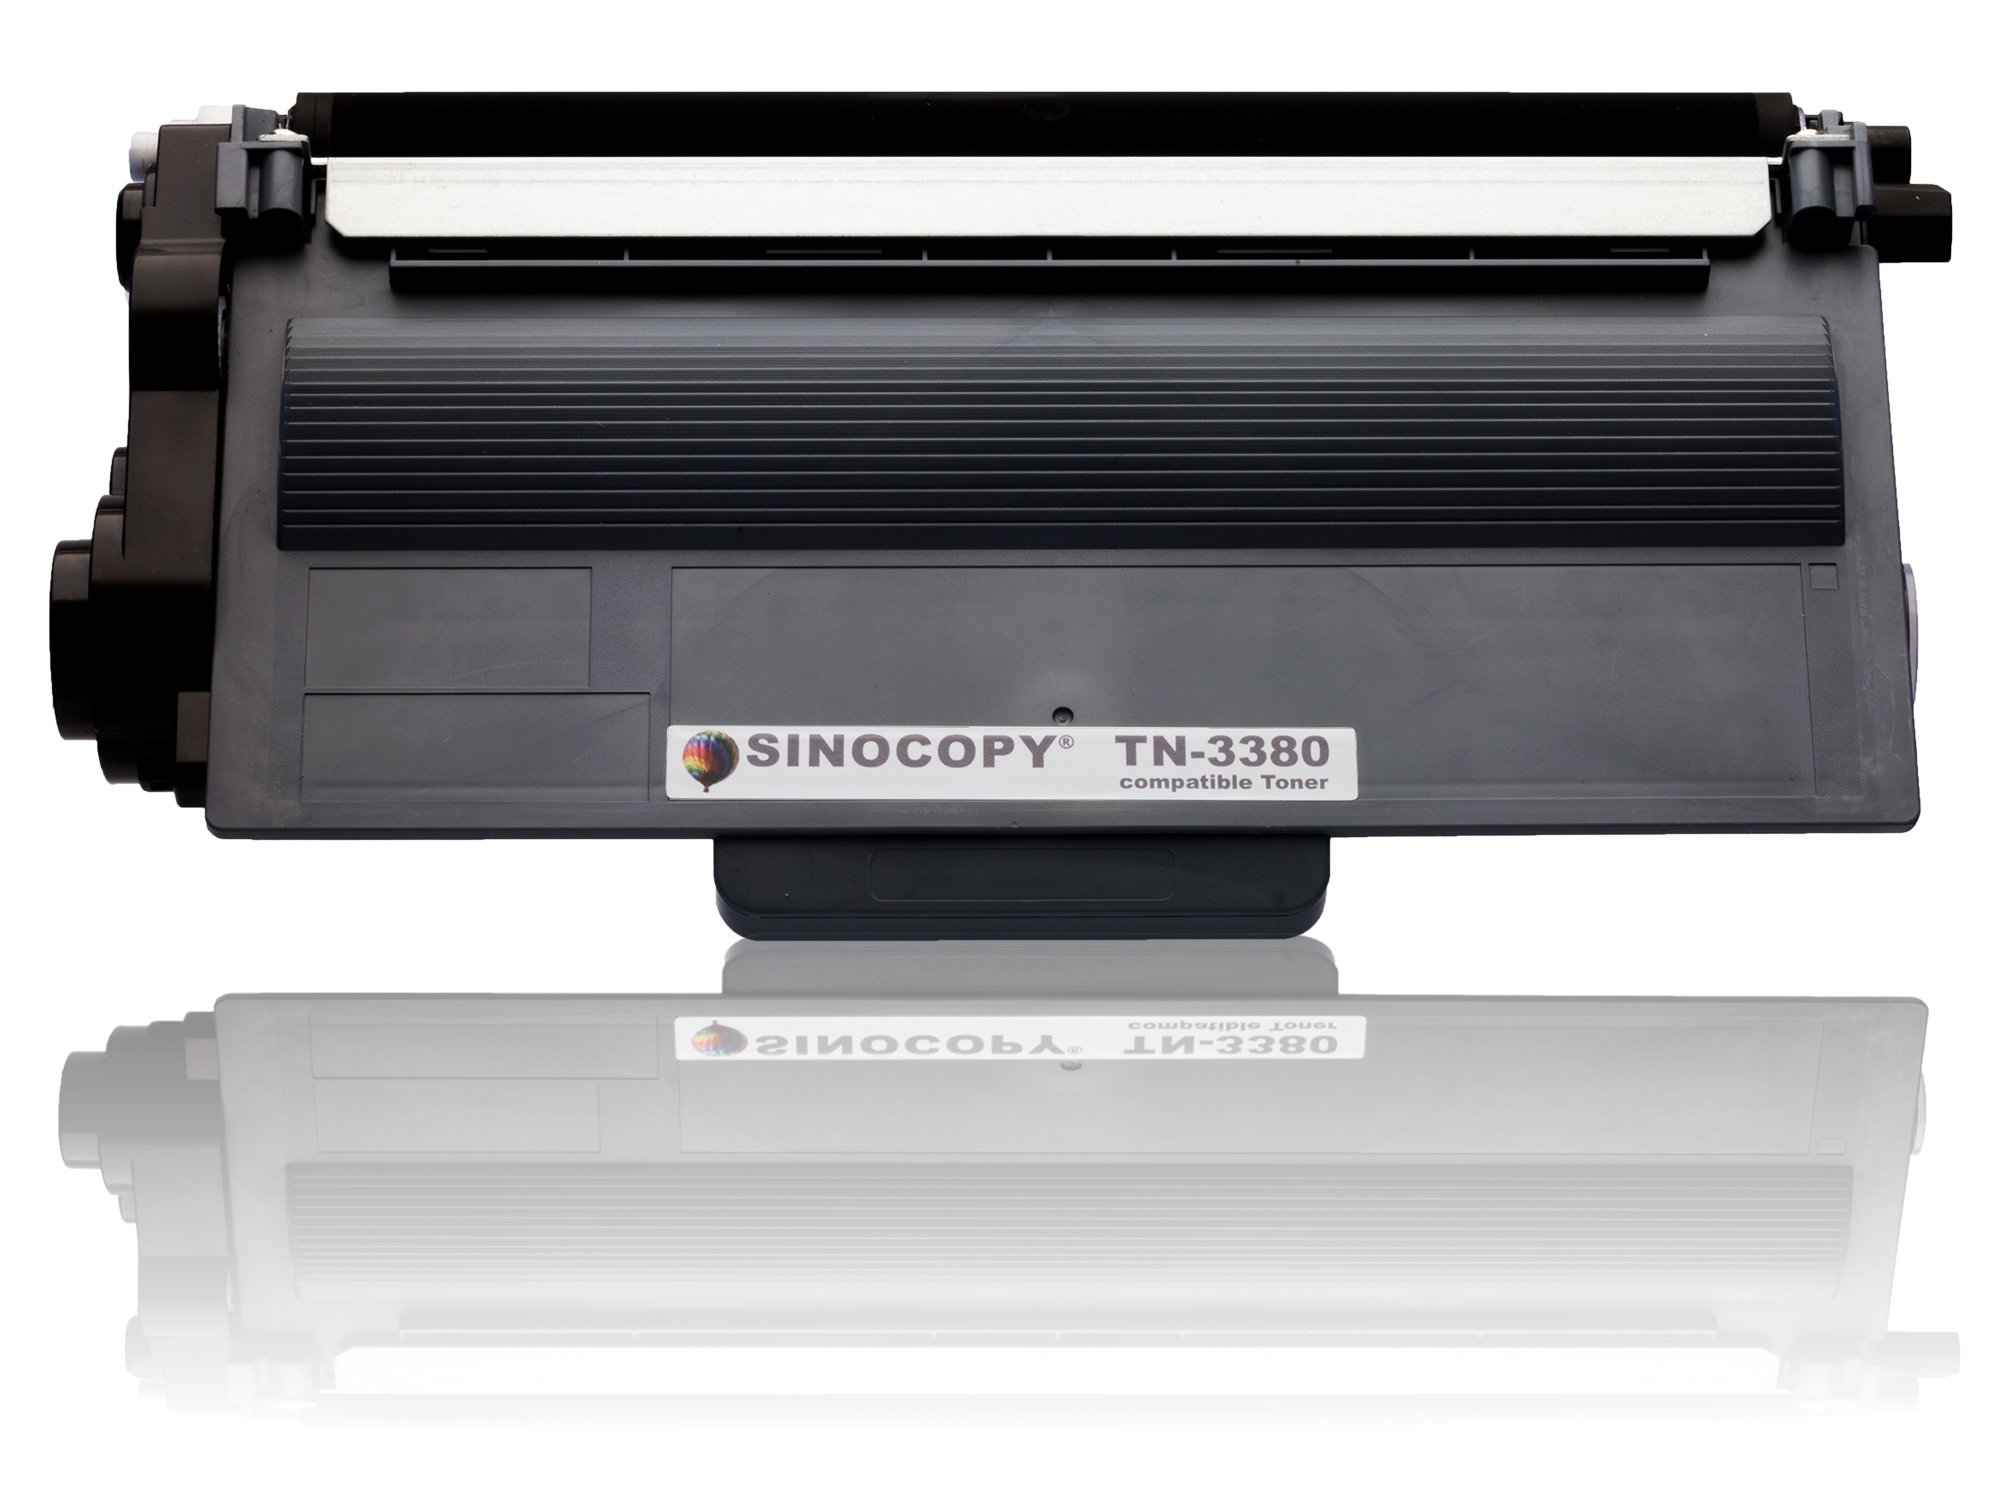 SinoCopy-XXL-Toner-TN-3380-Schwarz-fr-Brother-HL-5450-DCP-8100-Series-8110-8155-8250-HL-5400-5440-D-DNT-5470-DW-5480-6100-6180-MFC-8510-8515-8520-8710-8810-8900-8910-8950